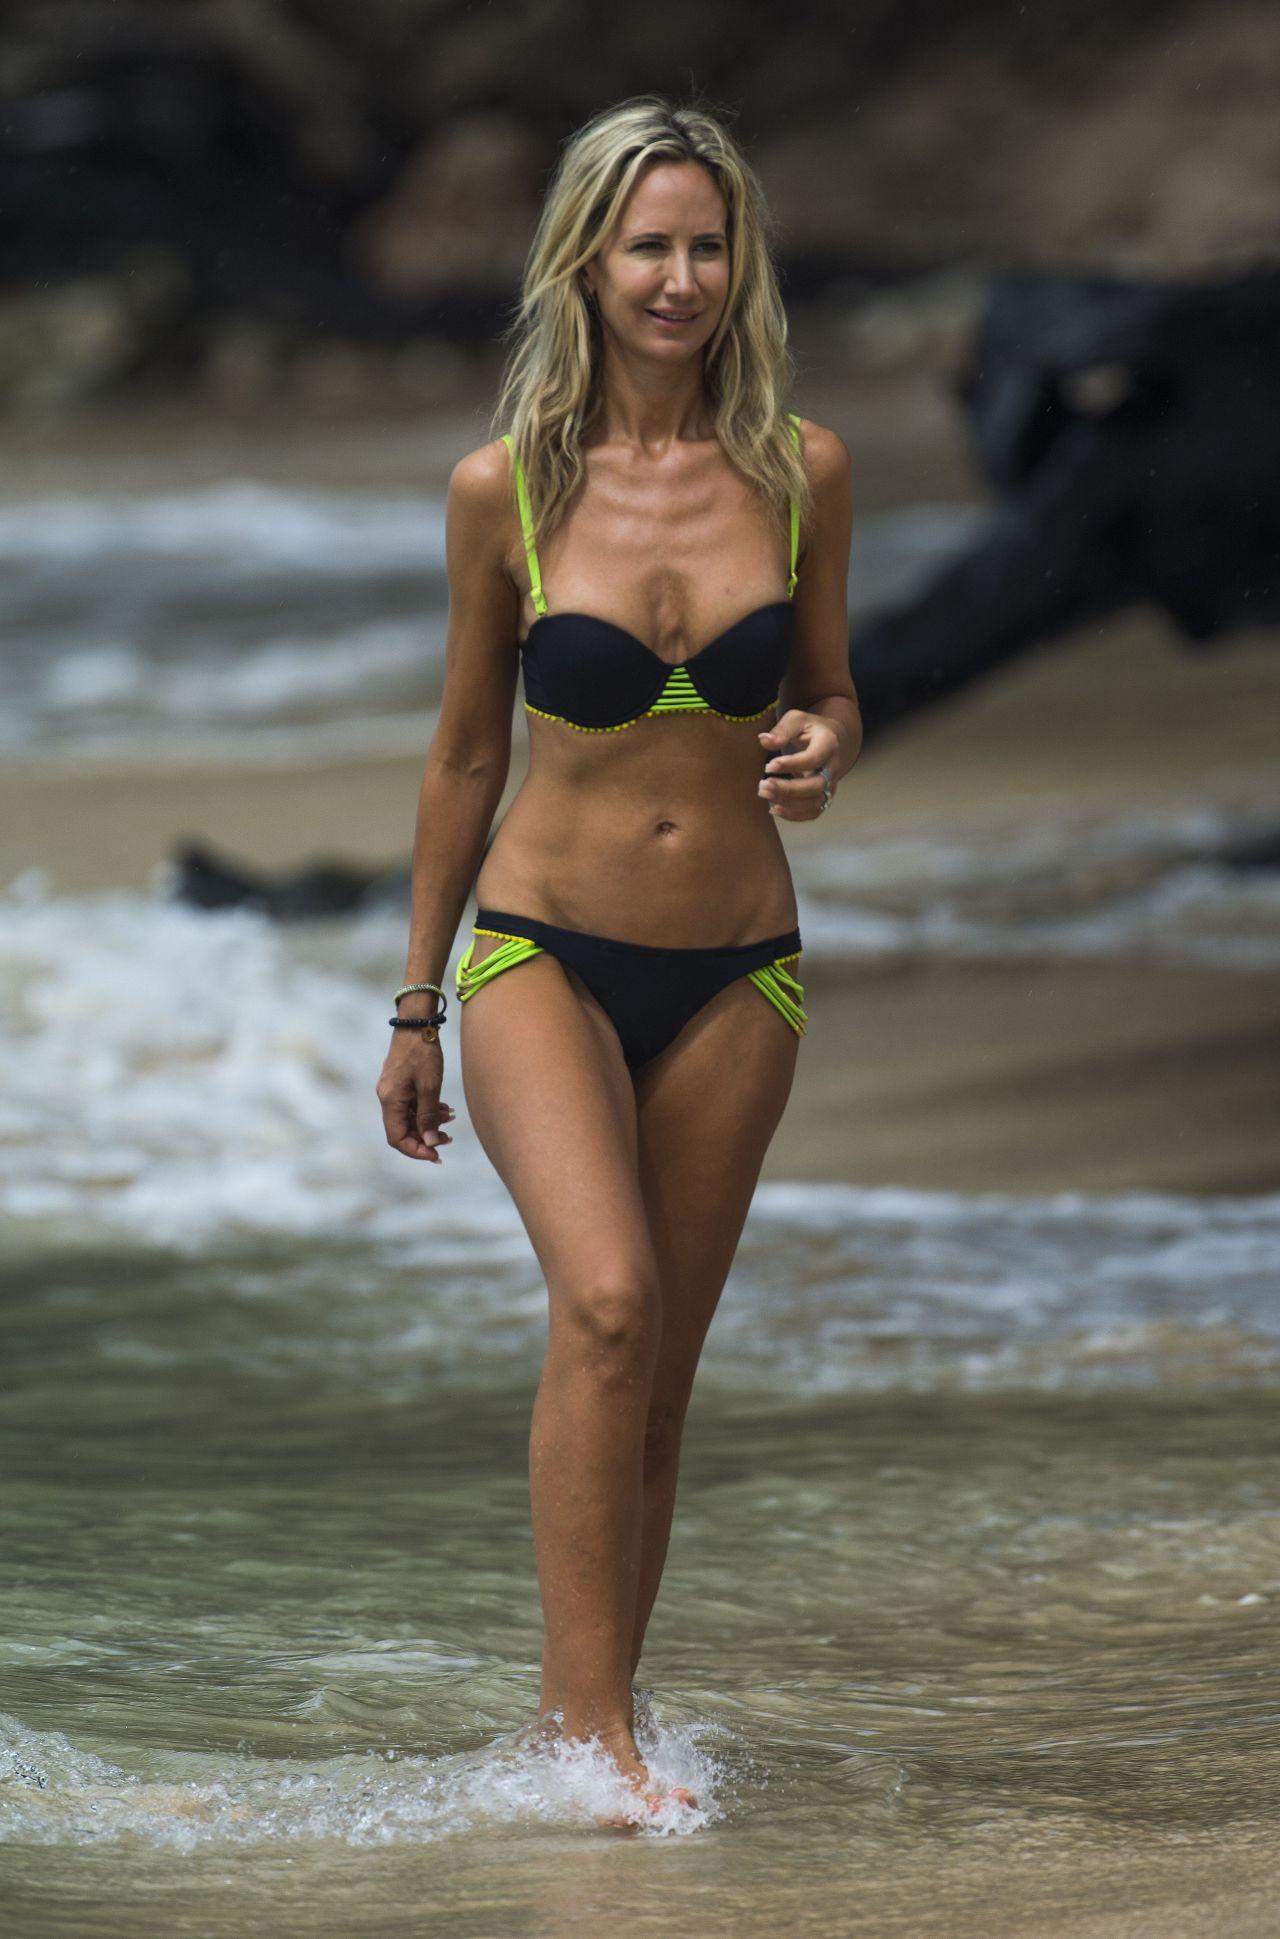 Lady Victoria Hervey in Bikini Boat Party in Barbados Pic 27 of 35